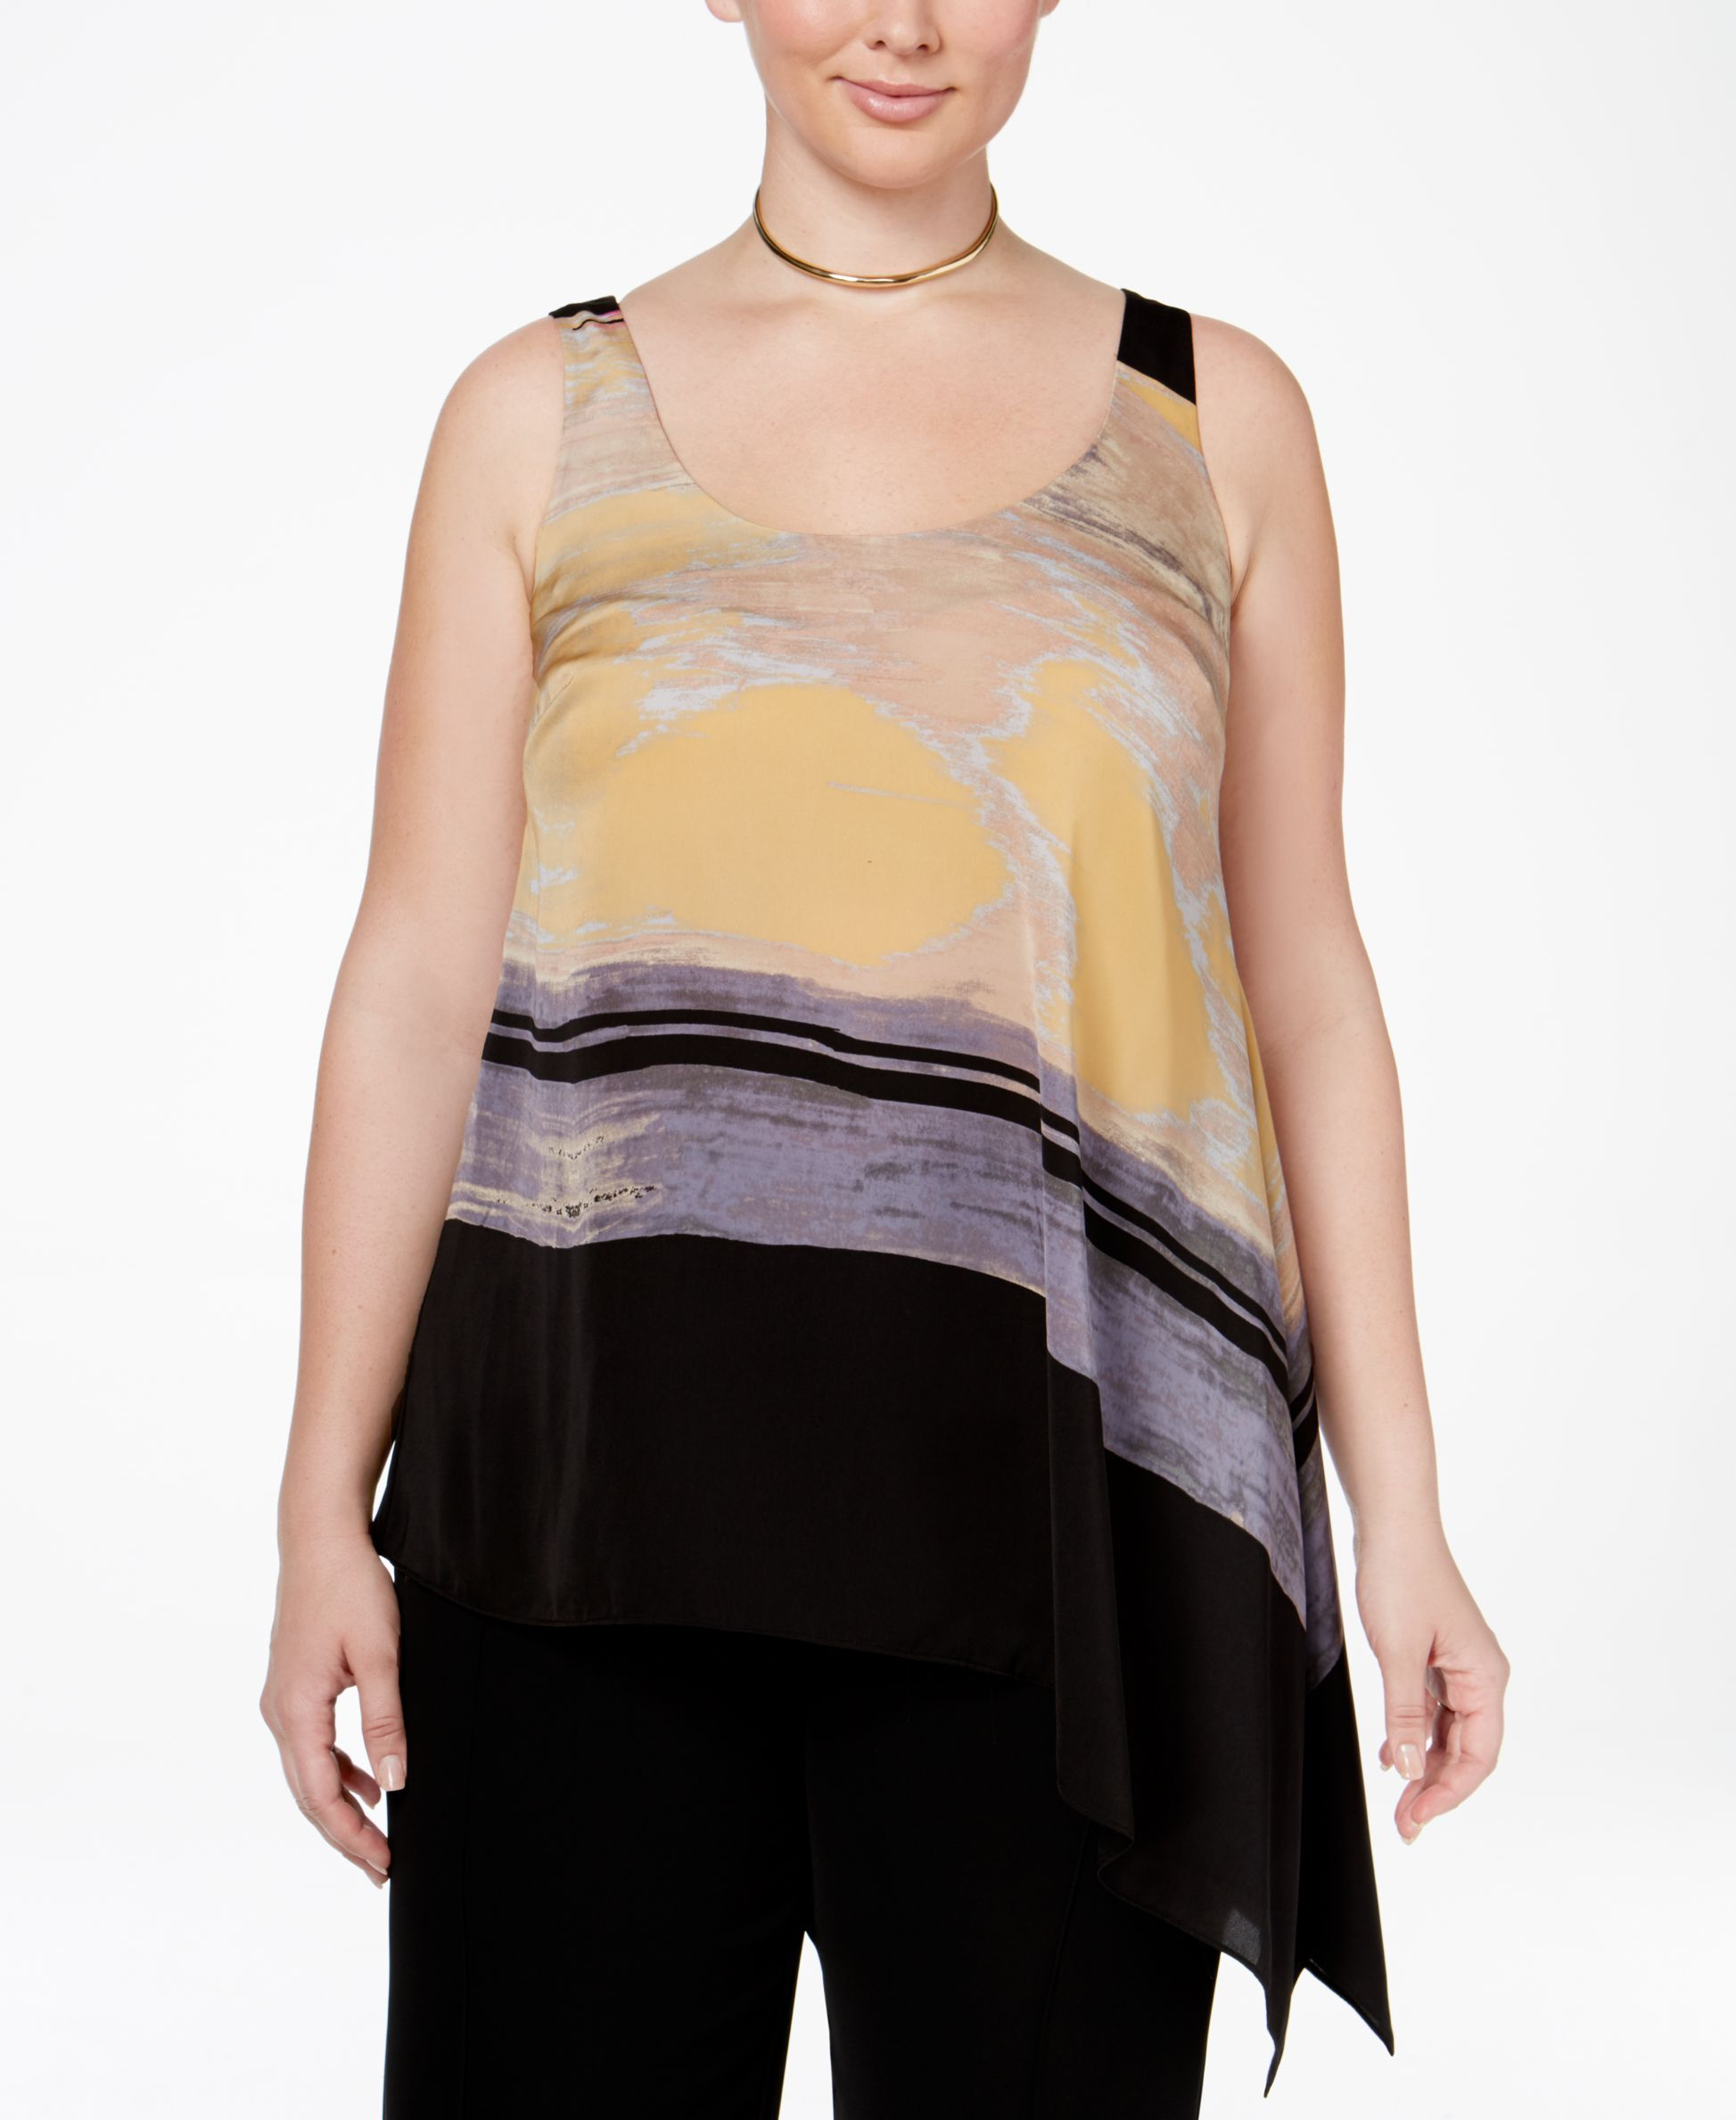 3328e185a1a Rachel Rachel Roy Curvy Plus Size Asymmetrical Printed Tank Top ...